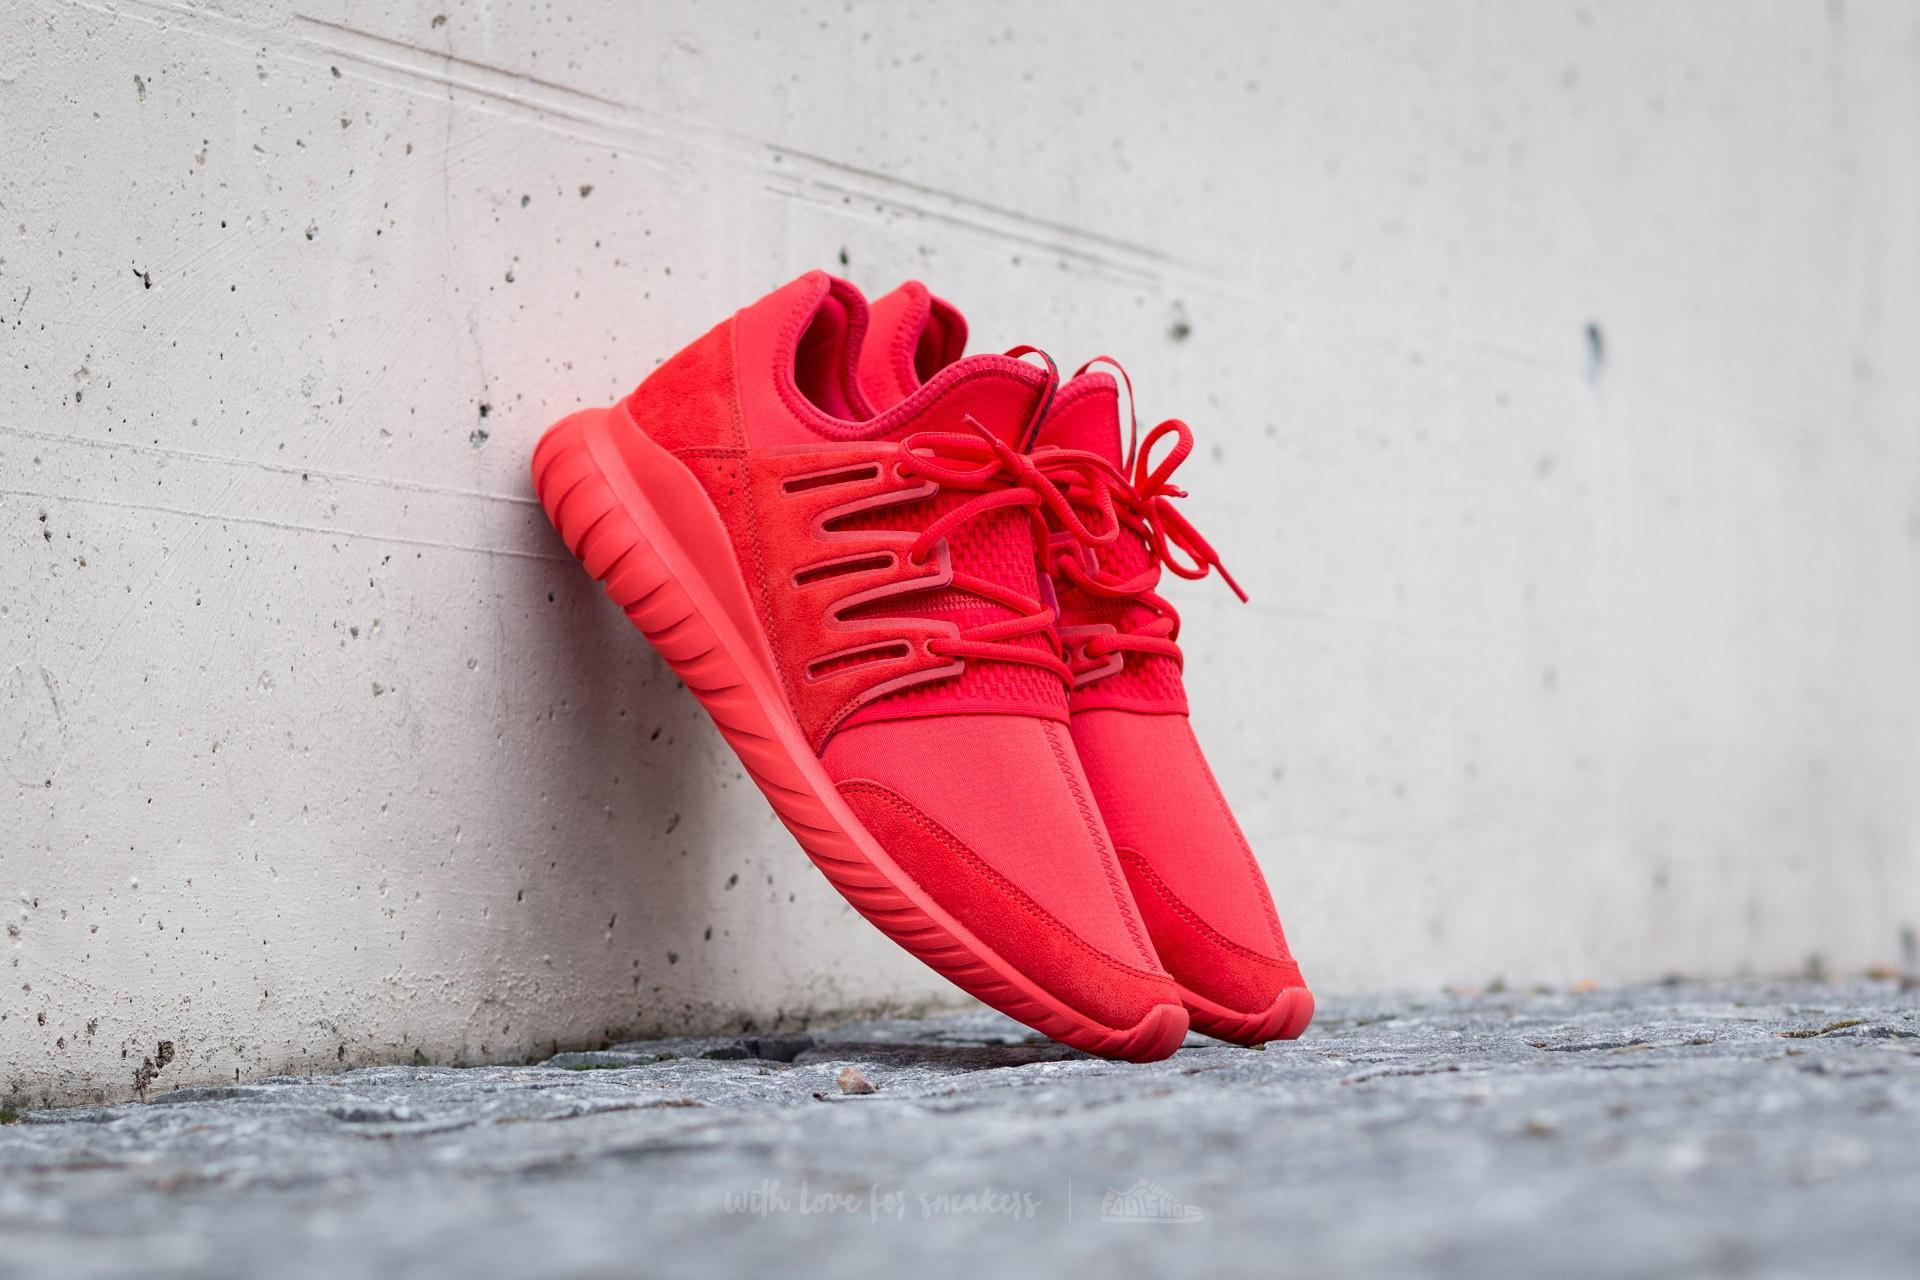 7c38c8e9cd79 adidas Tubular Radial Red  Red  Core Black